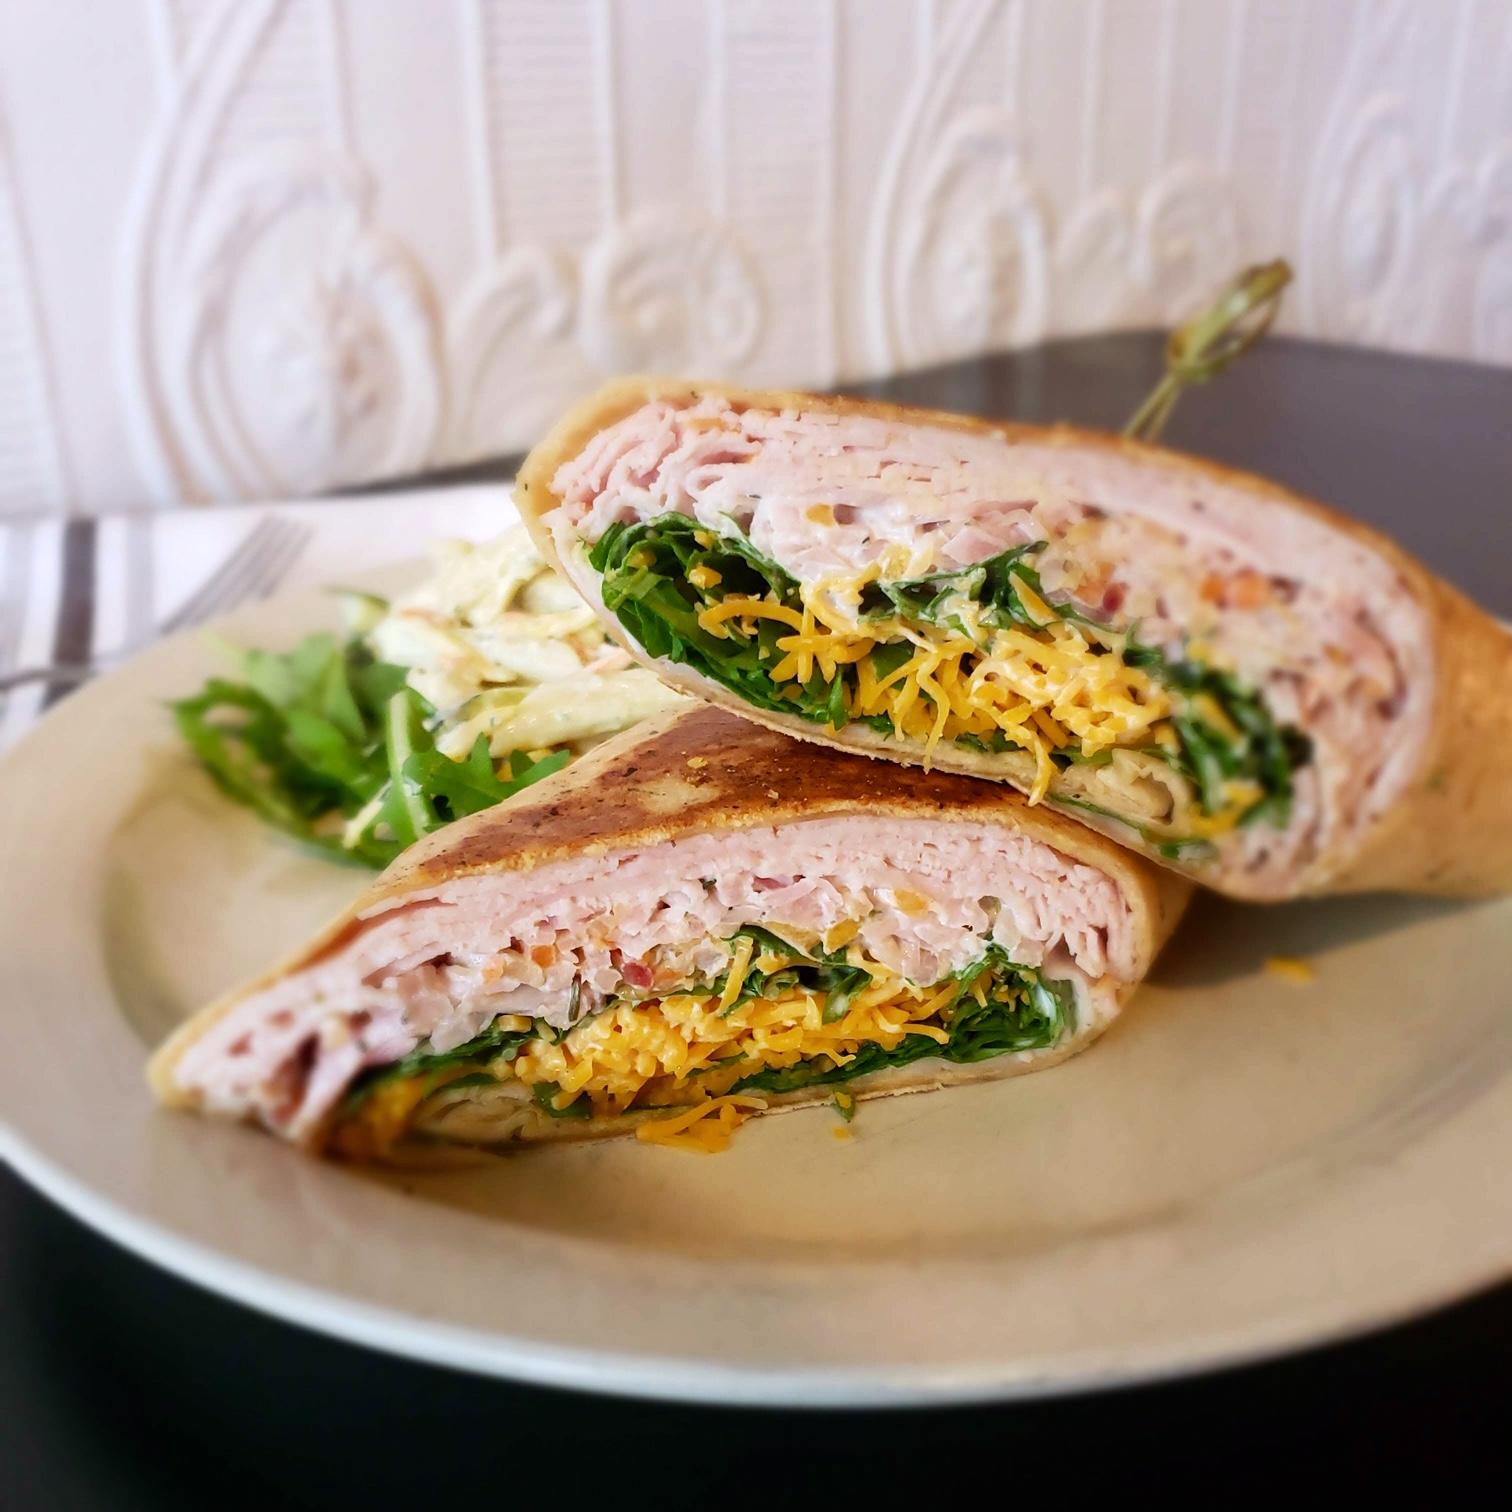 turkey-wrap-lunch-holland-waverly-stone